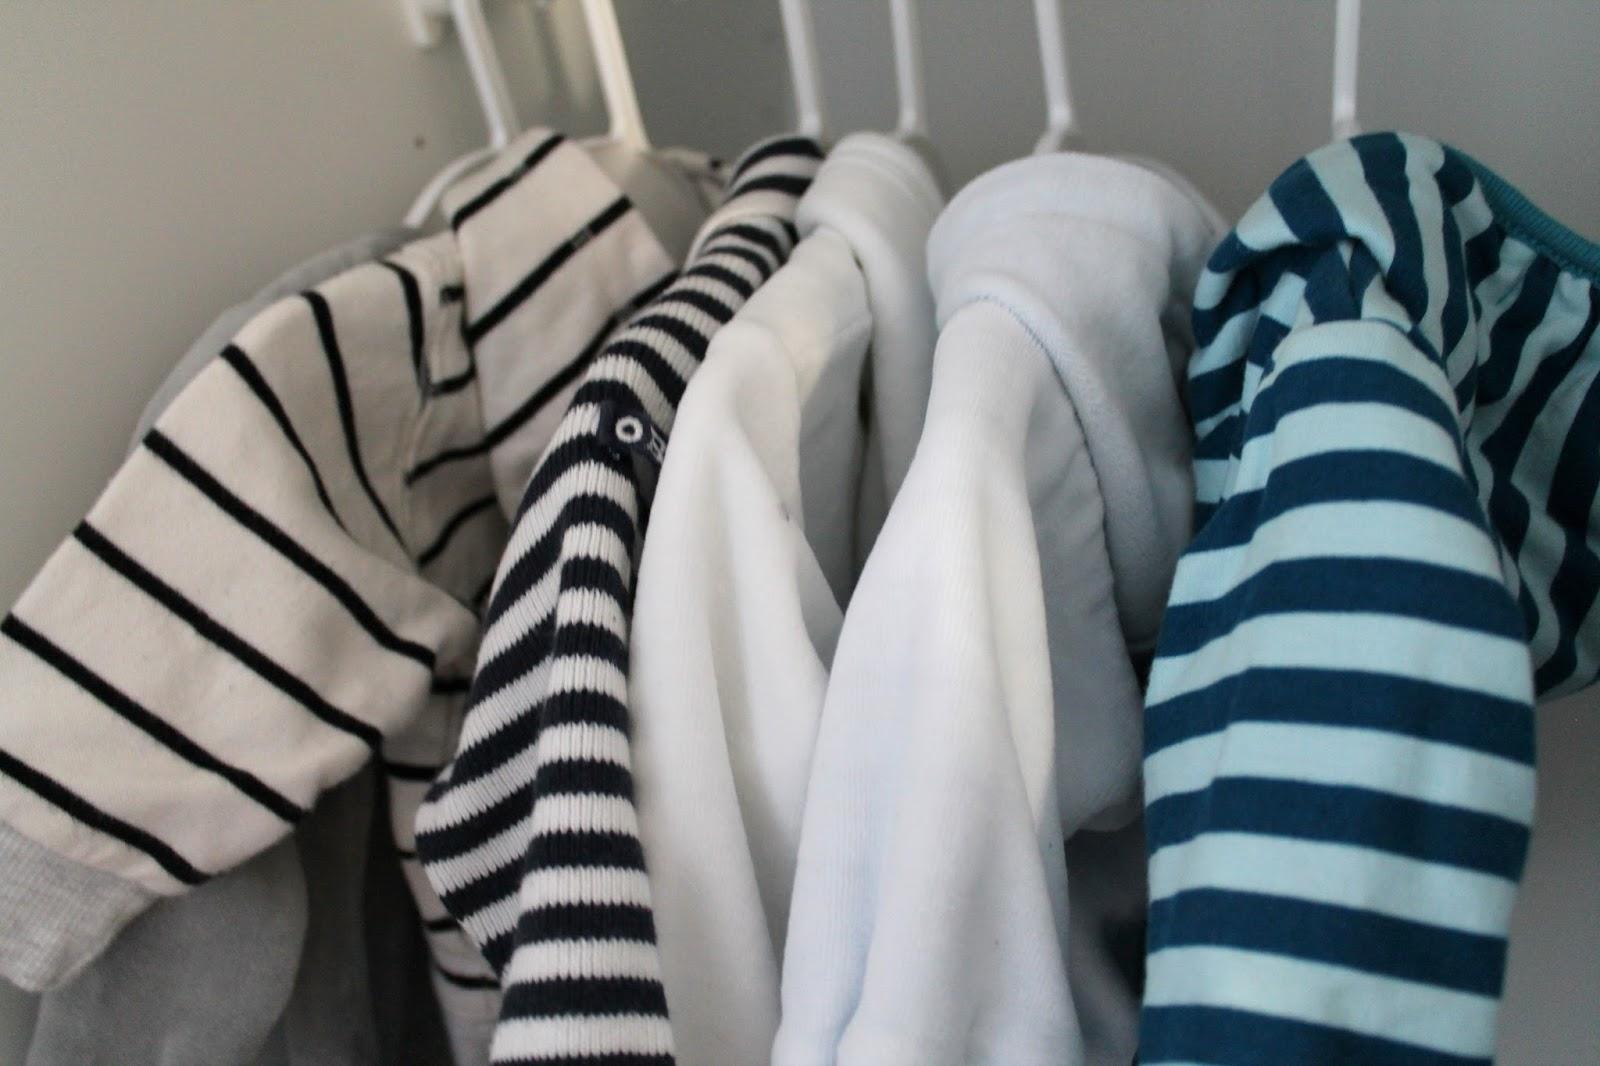 Kleiderschrank fertig